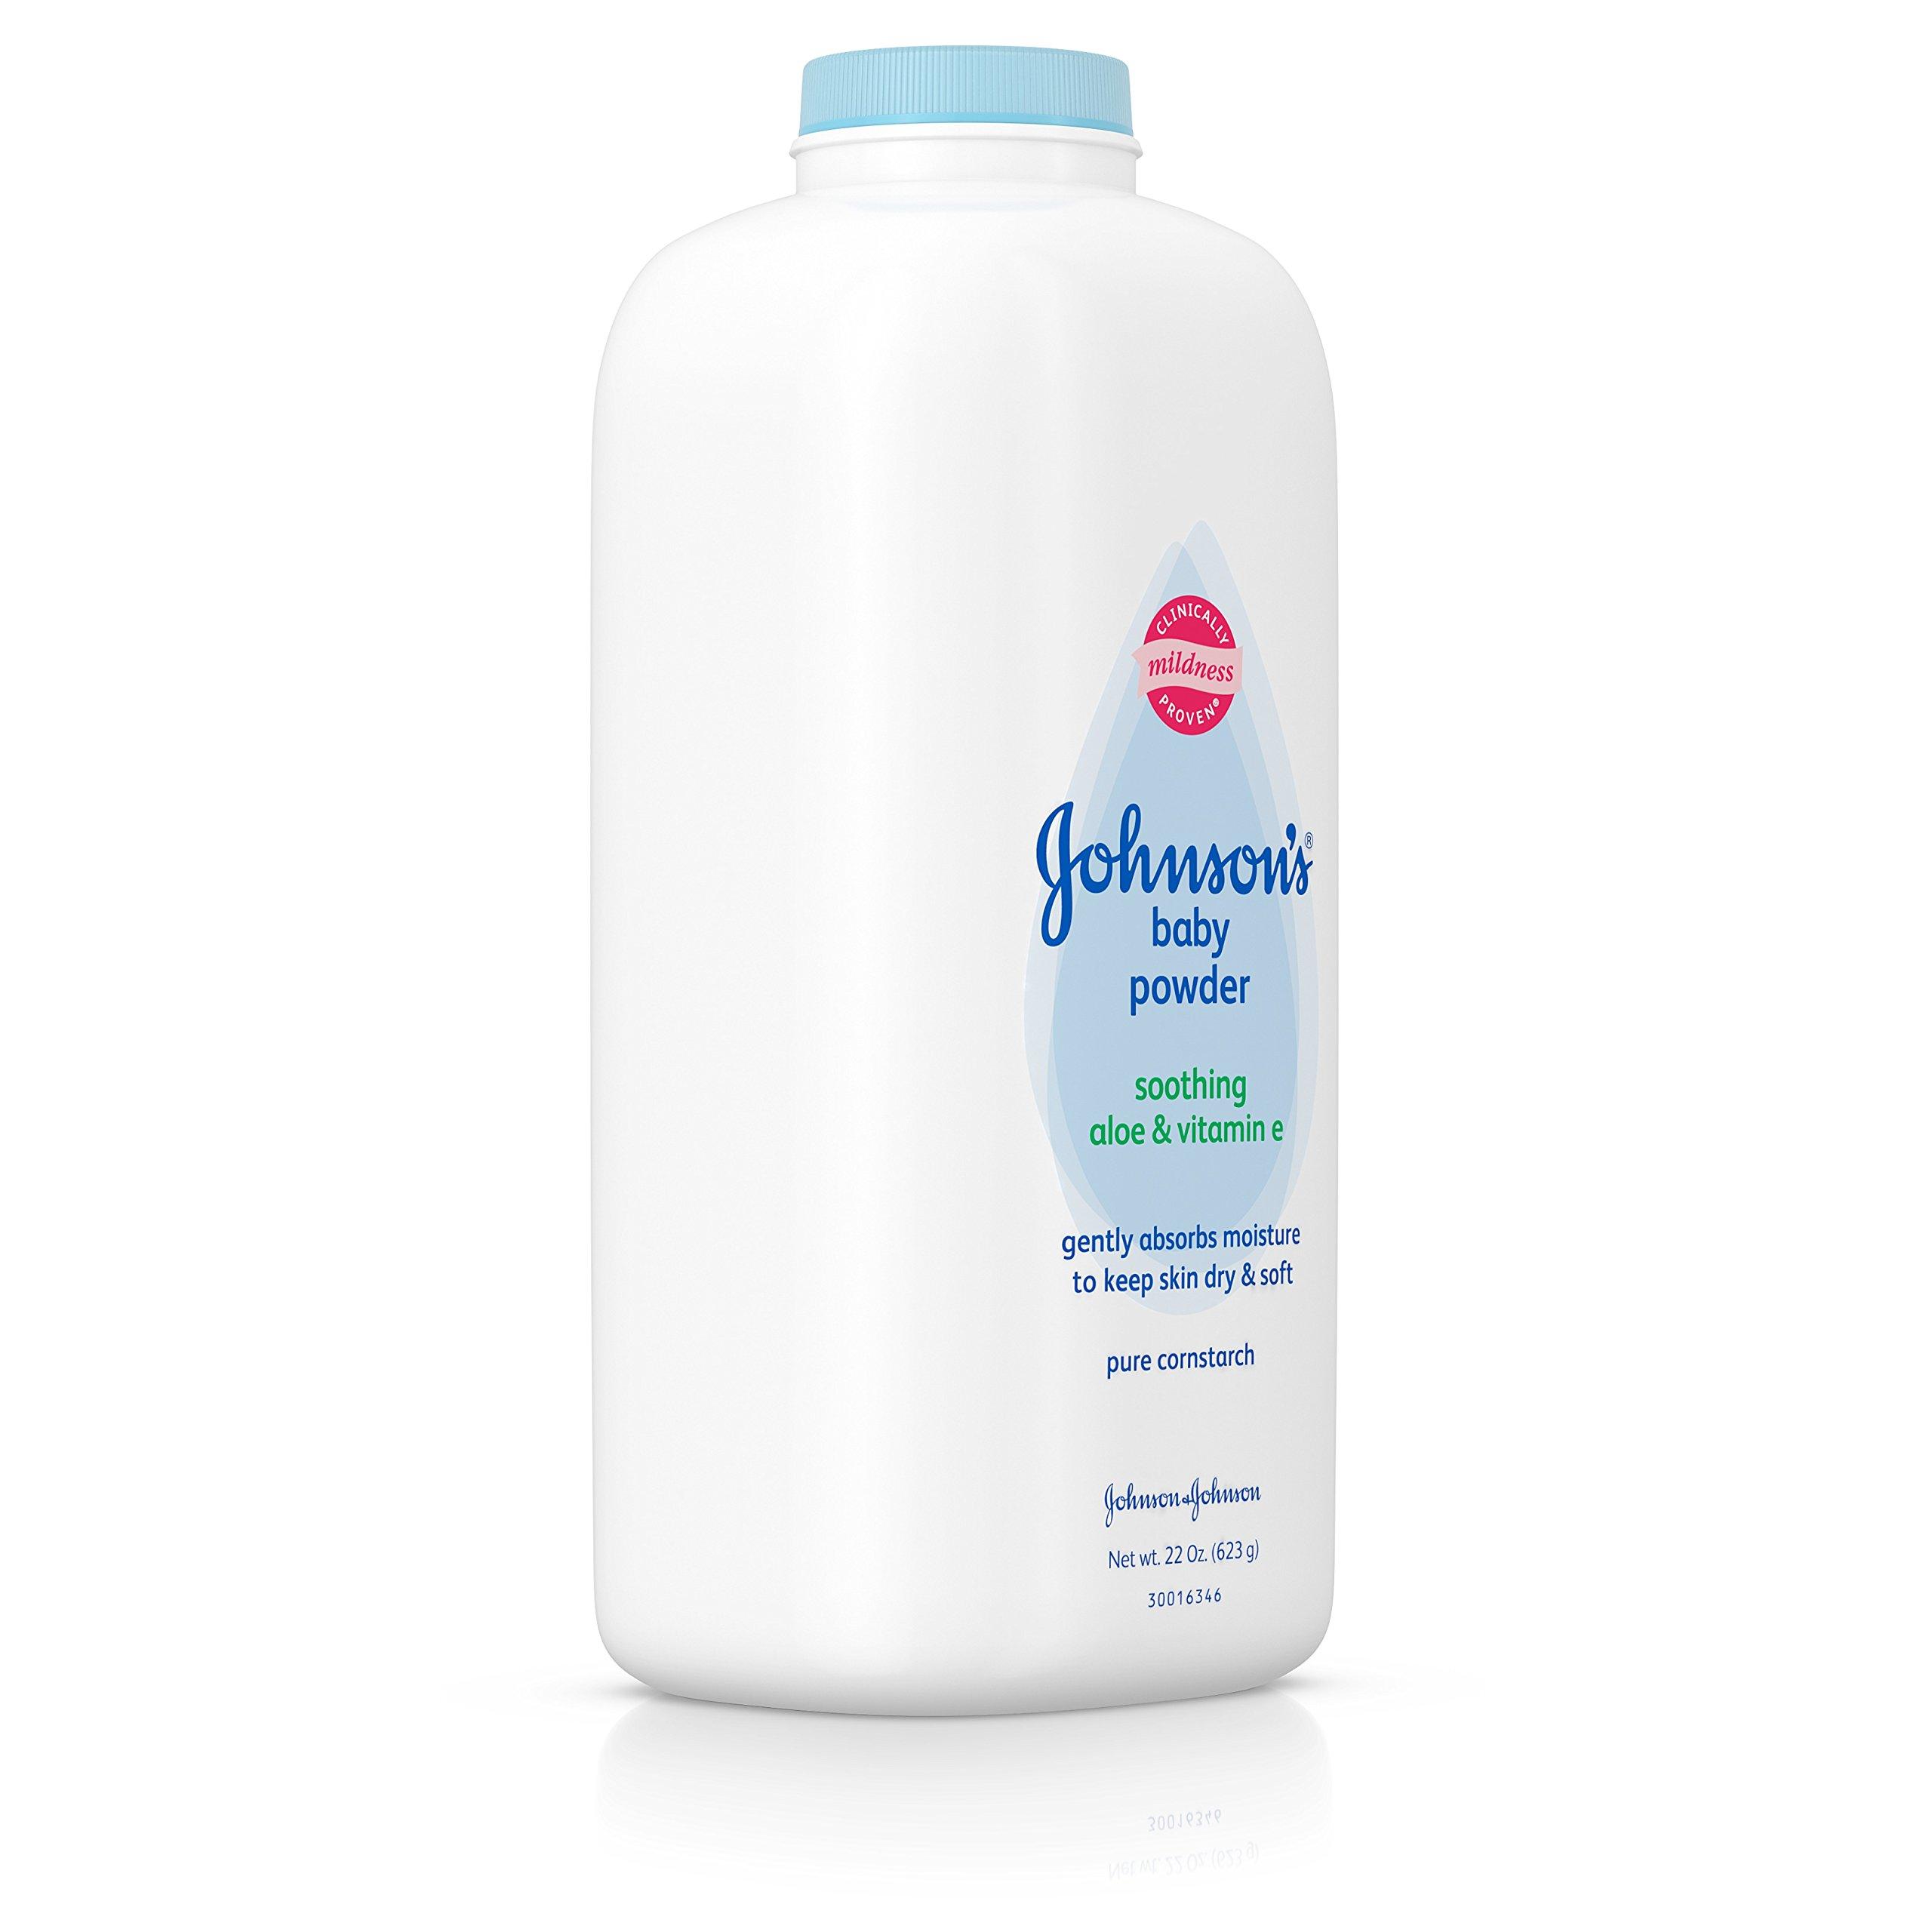 Johnson's Baby Powder With Aloe Vera & Vitamin E, Diaper Rash Protection, 22 Oz. (Pack of 6) by Johnson's Baby (Image #3)